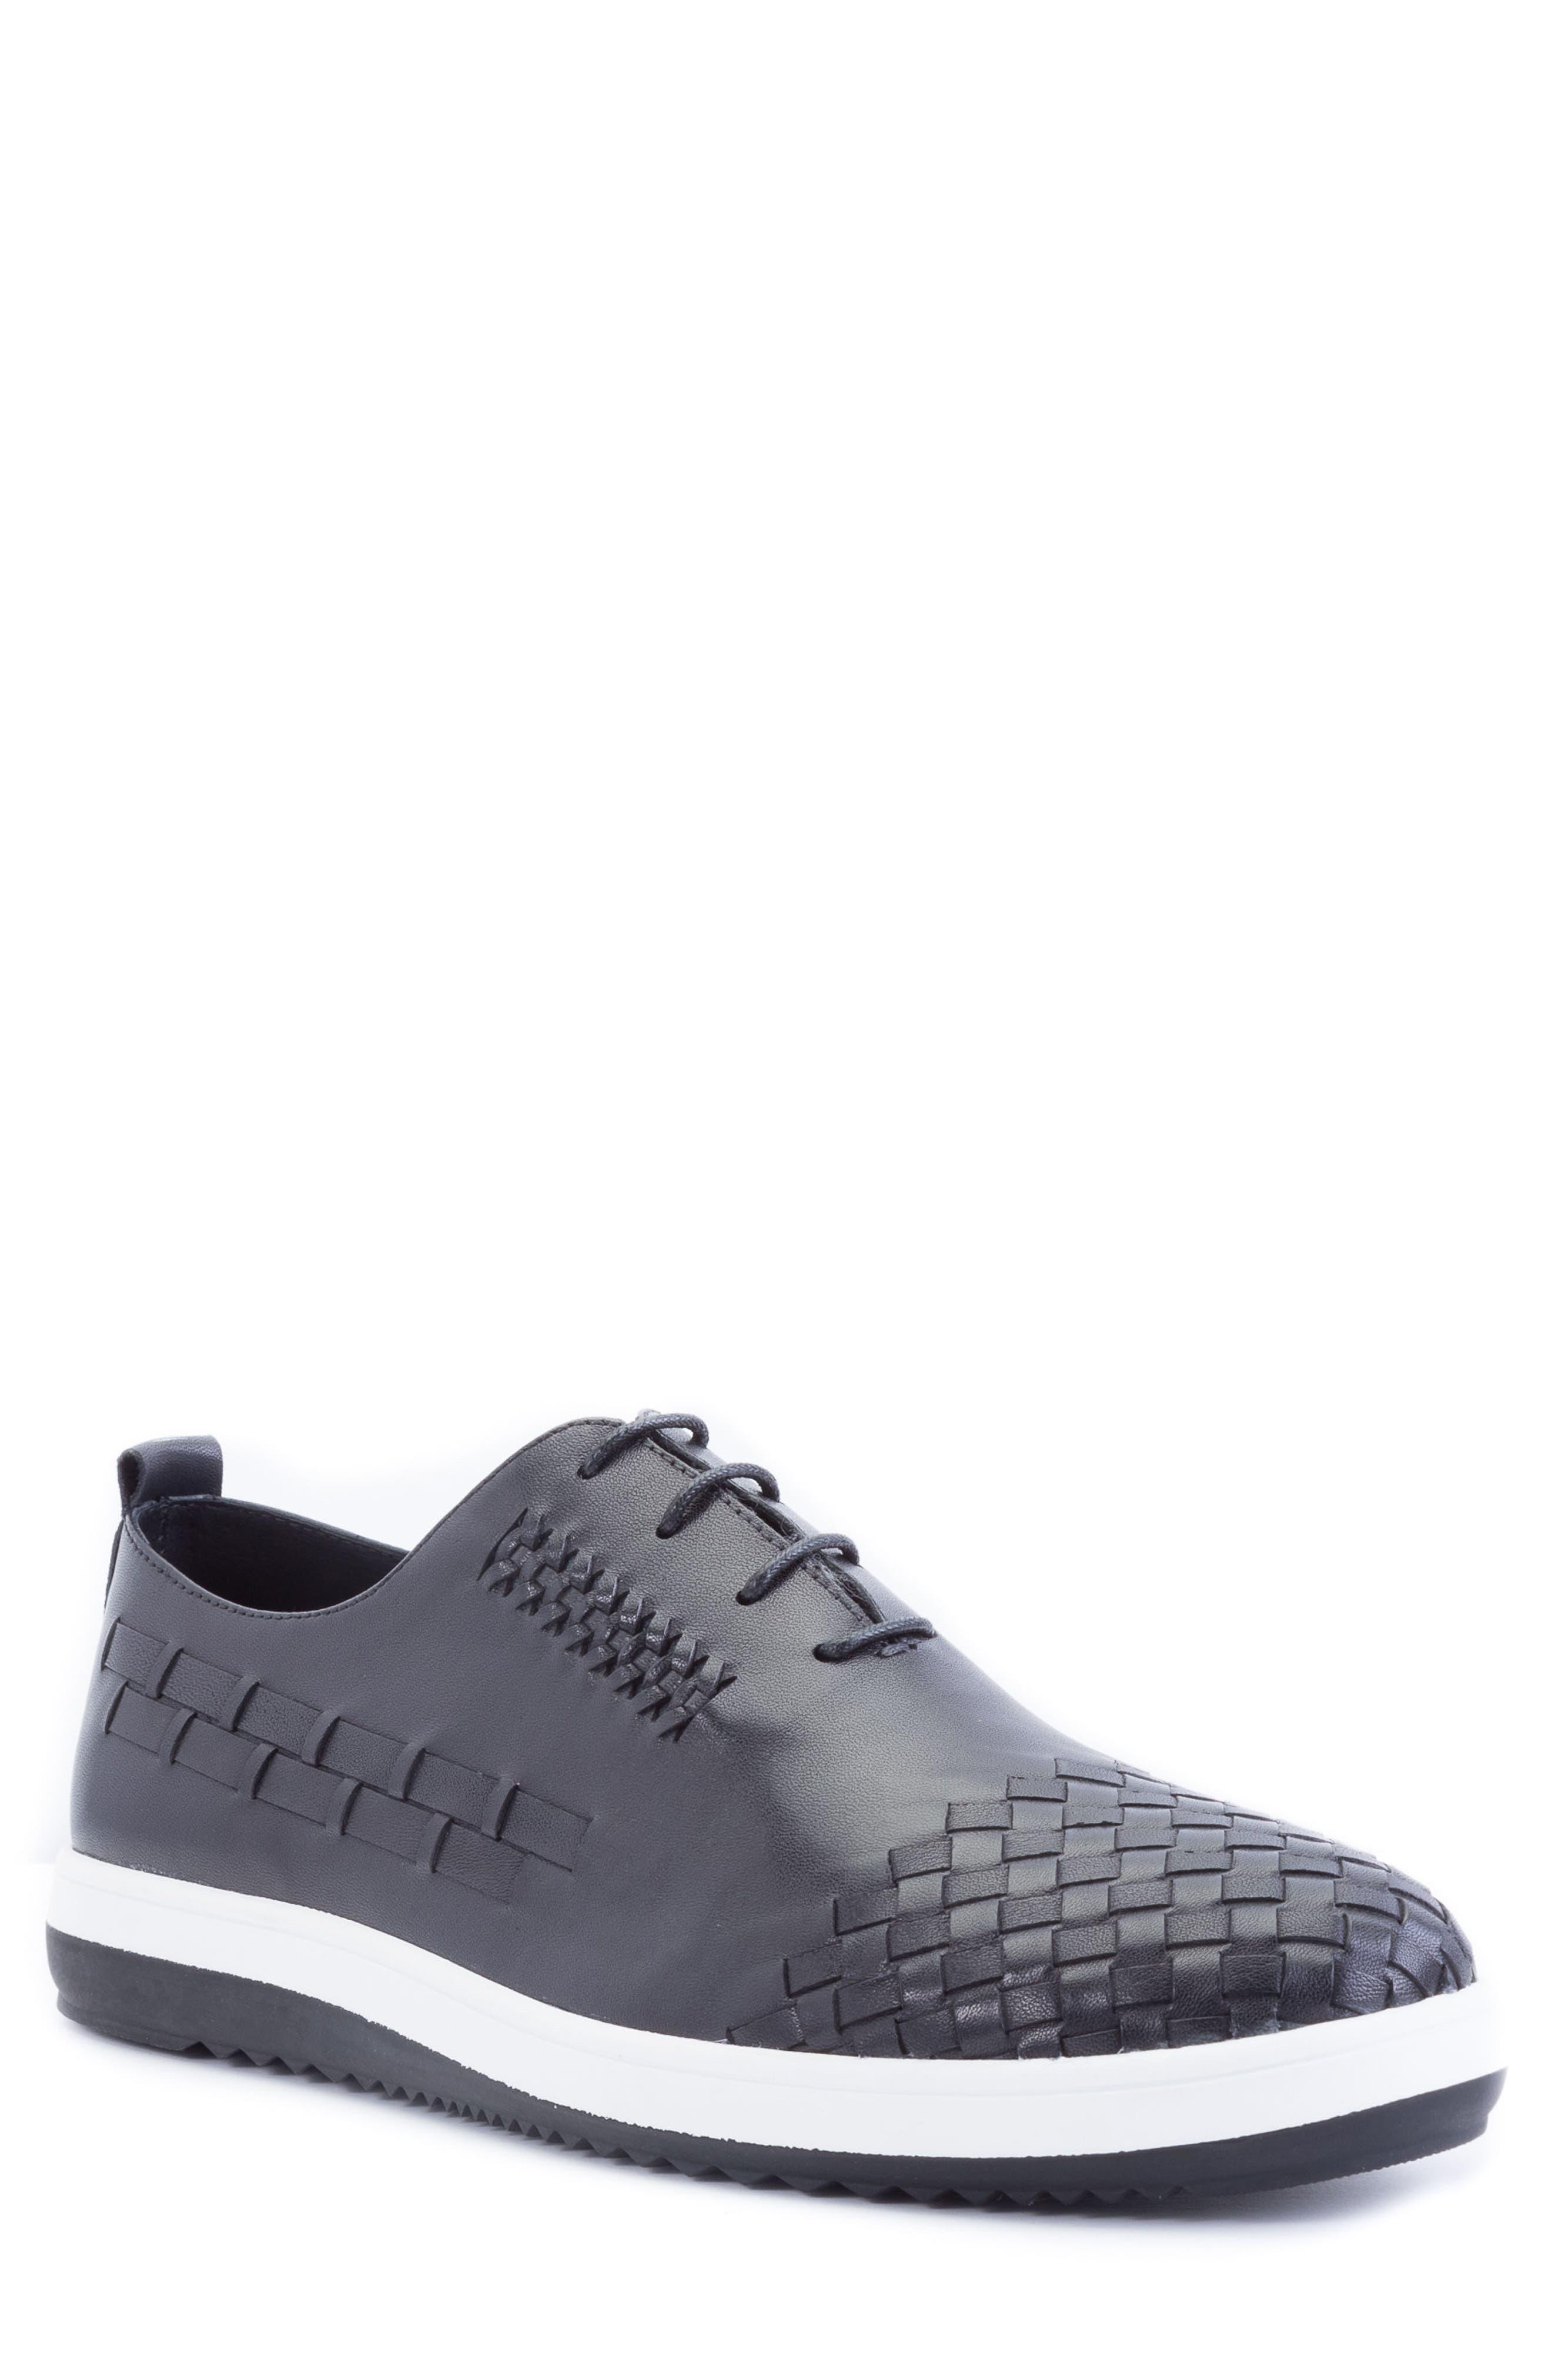 Zanzara Digital Woven Cap Toe Sneaker, Black